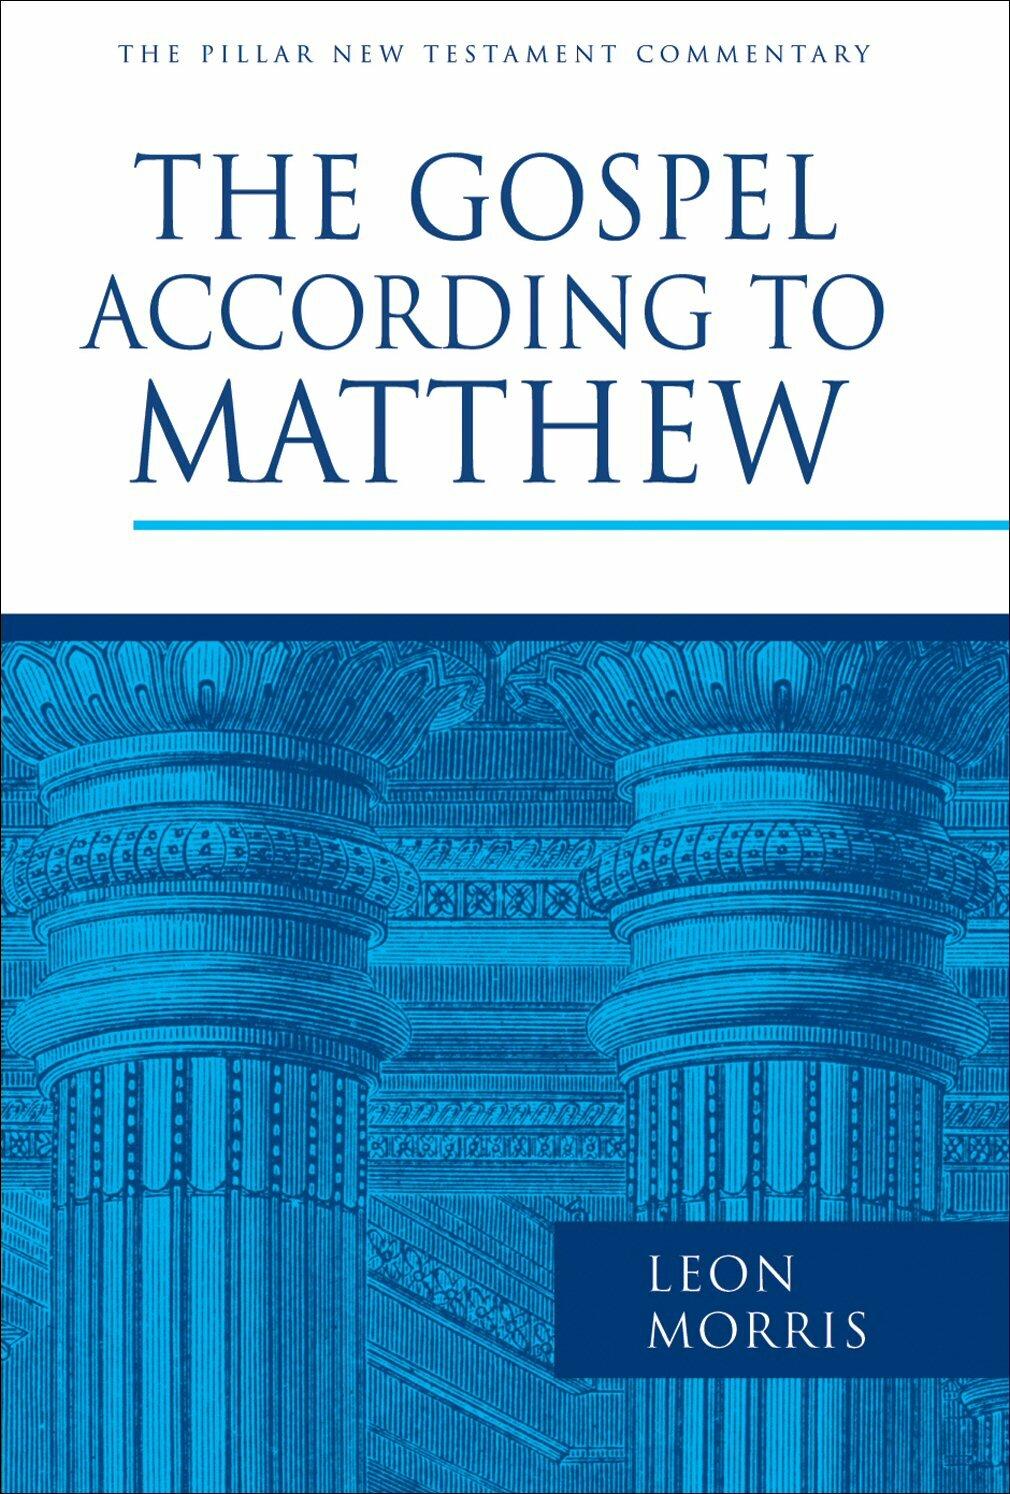 The Gospel according to Matthew (Pillar New Testament Commentary | PNTC)